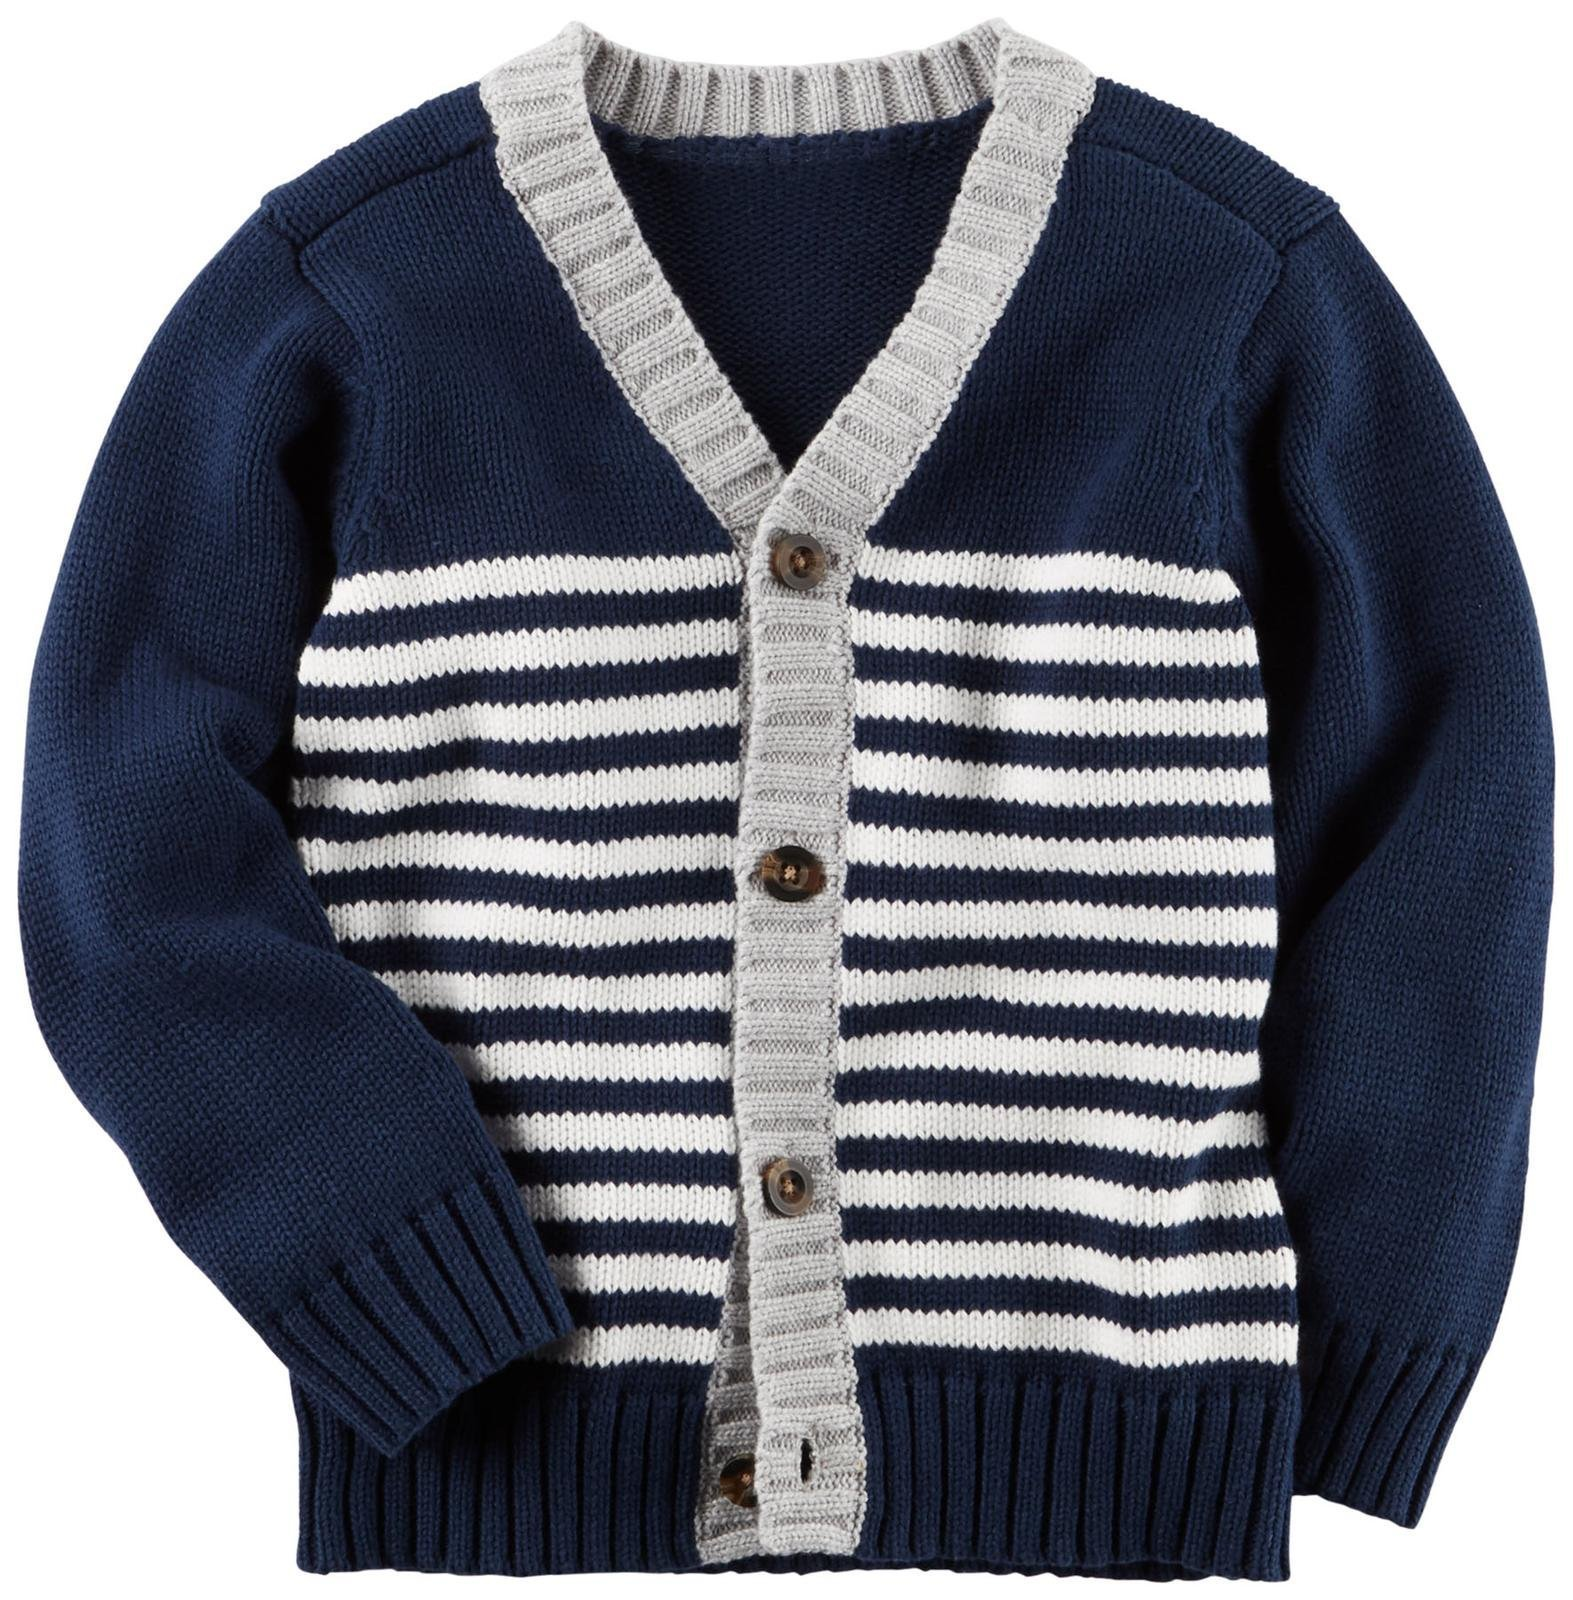 Carter's Boys' Sweater 243g870, Stripe, 2T